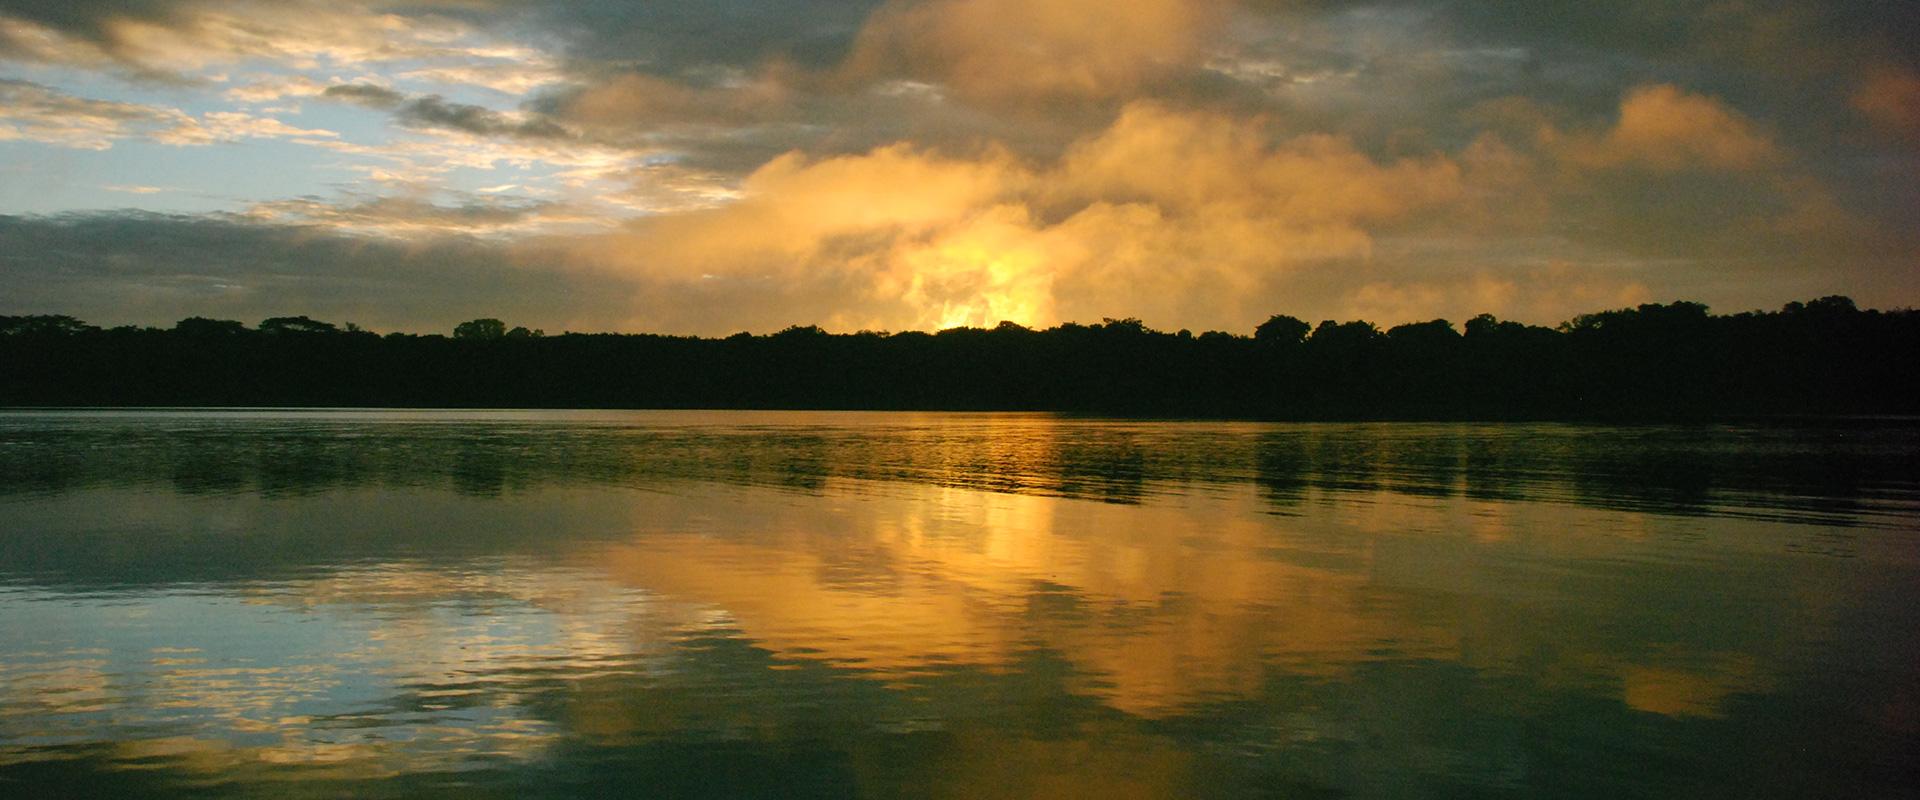 Napo River Sunset